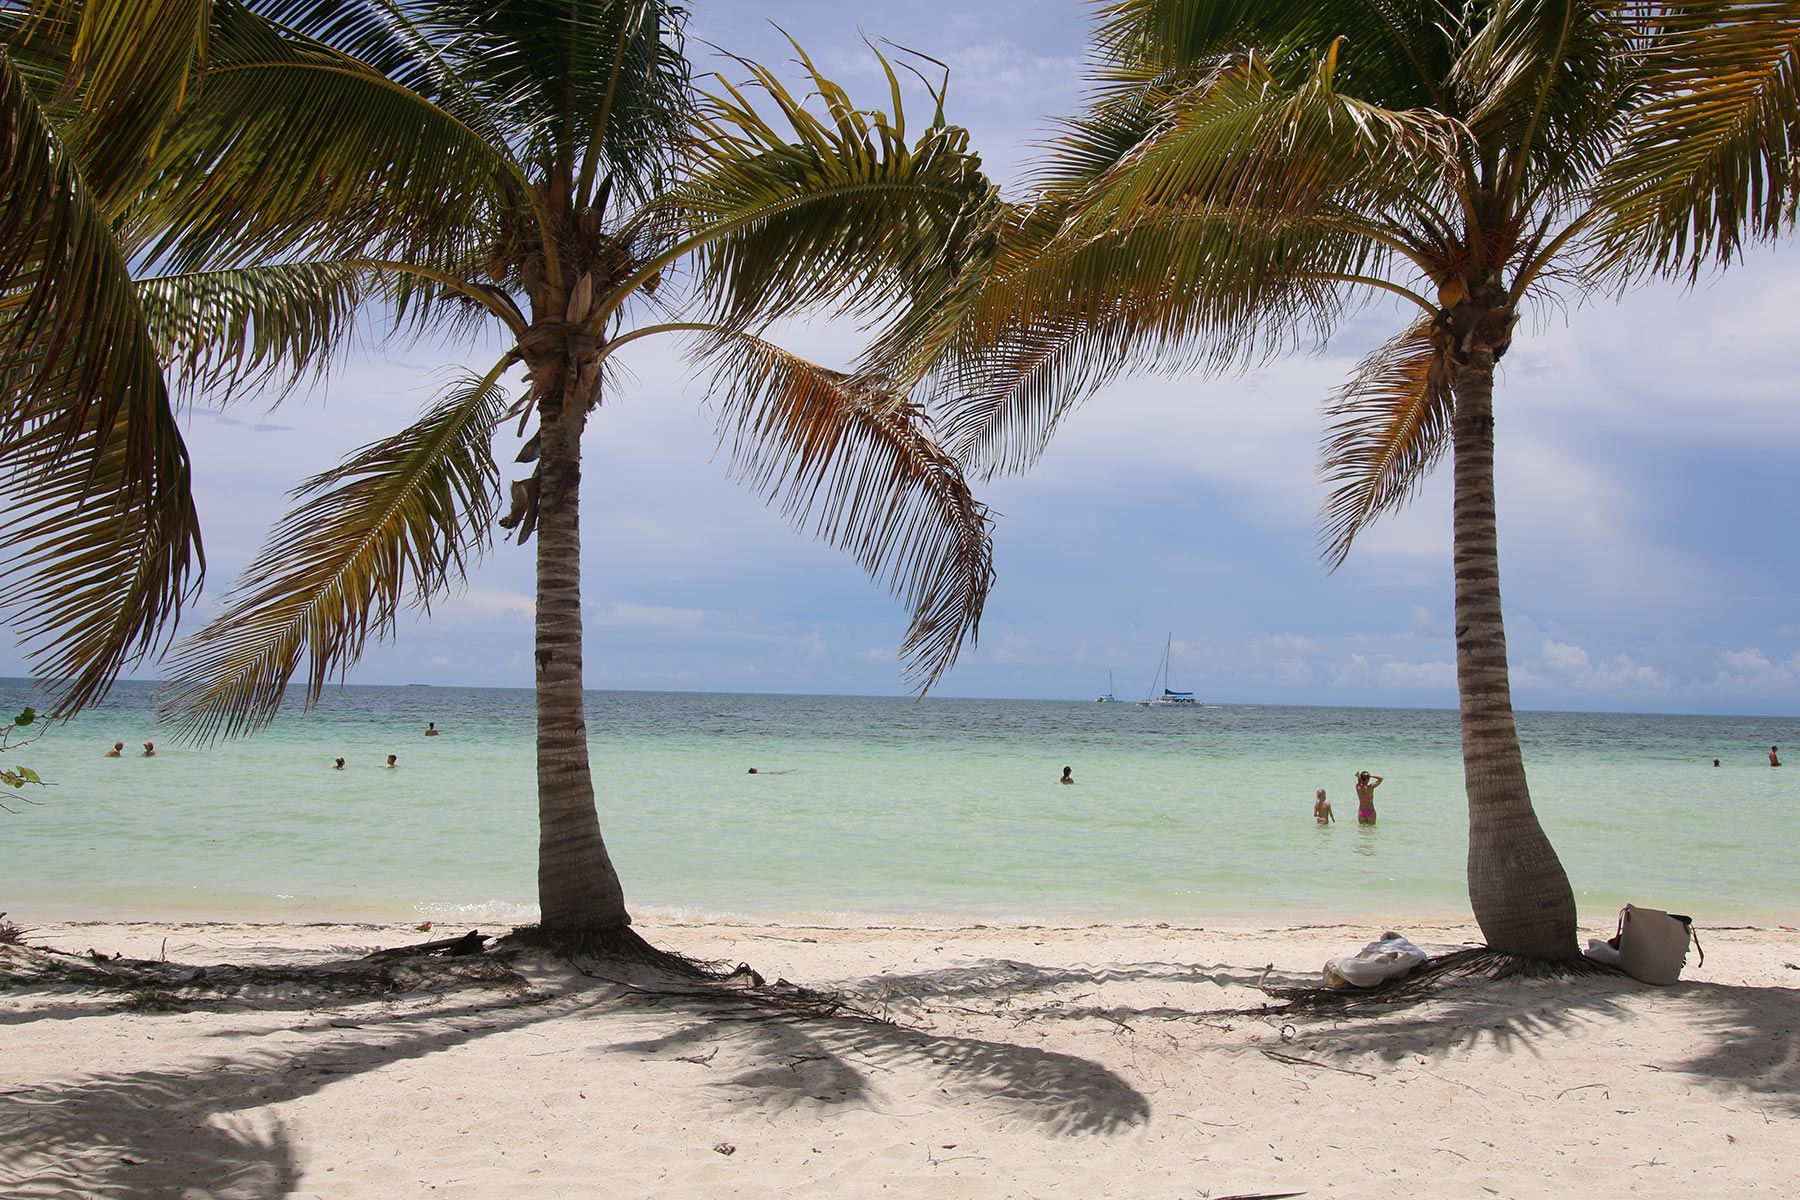 Varadero, Cuba's resort island